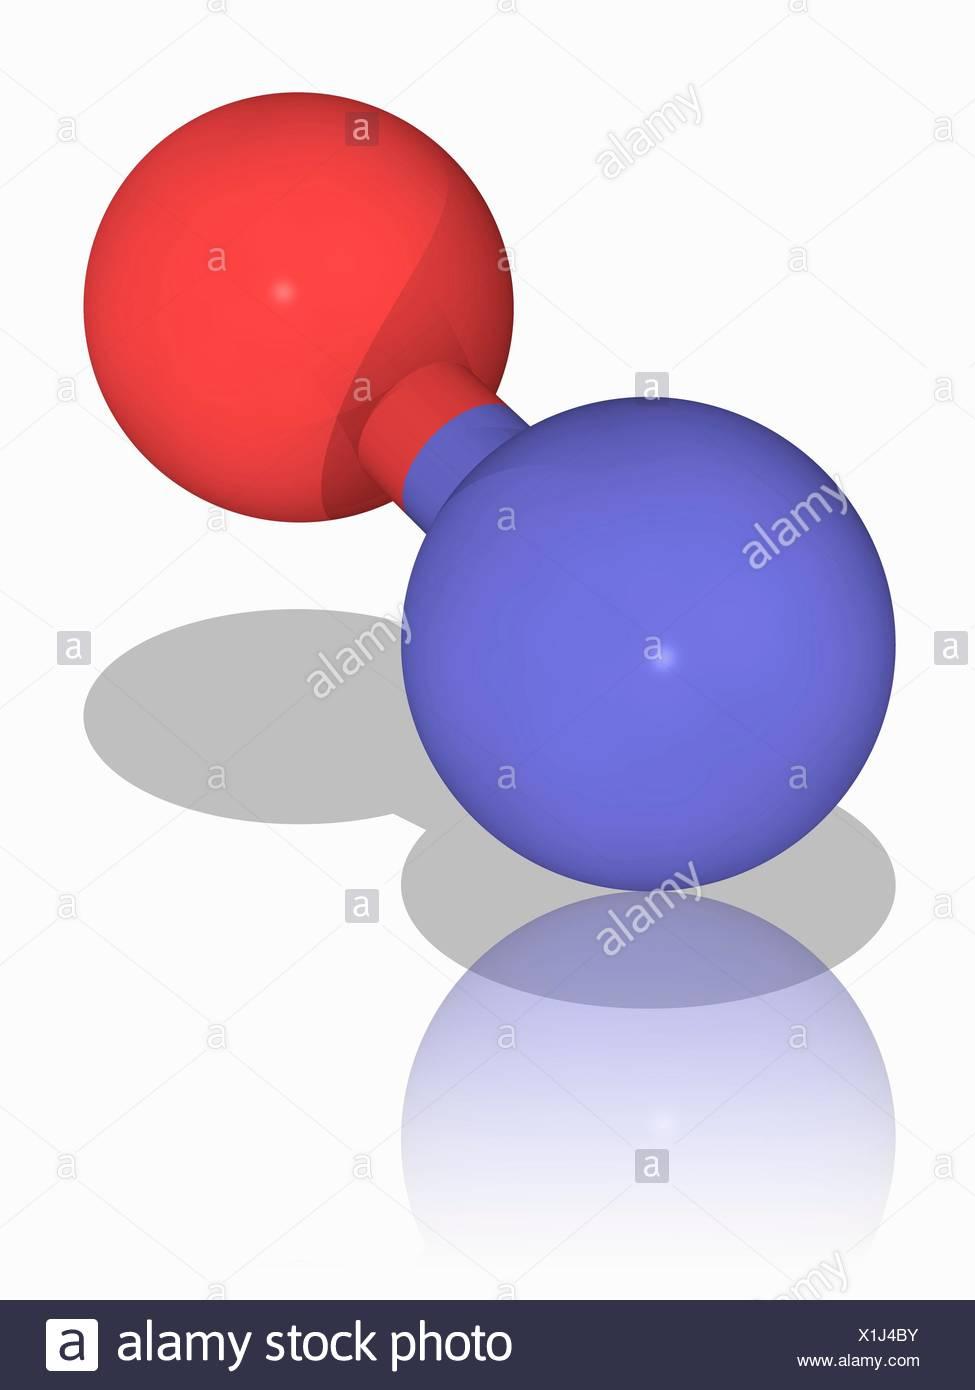 stickstoffmonoxid